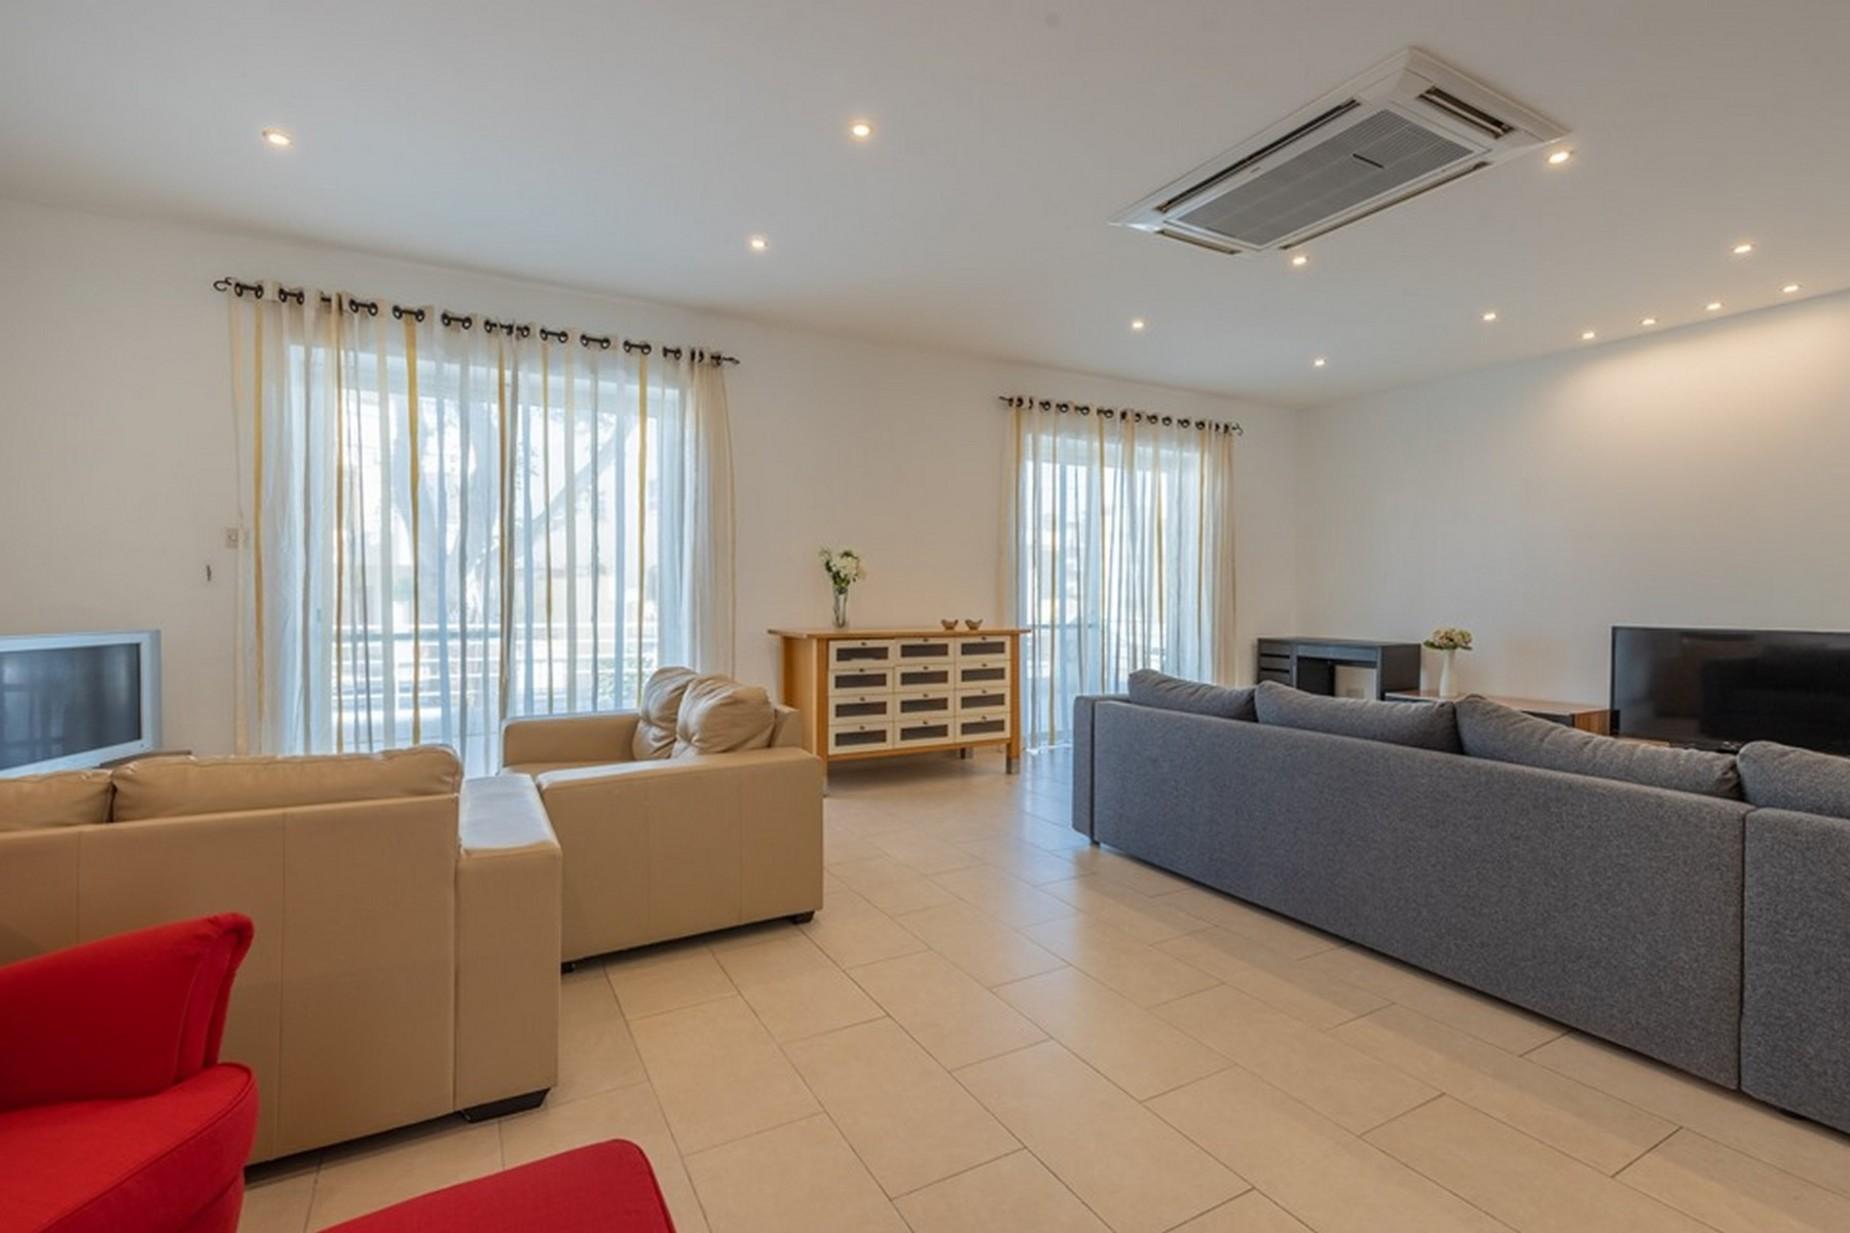 3 bed Maisonette For Rent in Ibragg, Ibragg - thumb 21